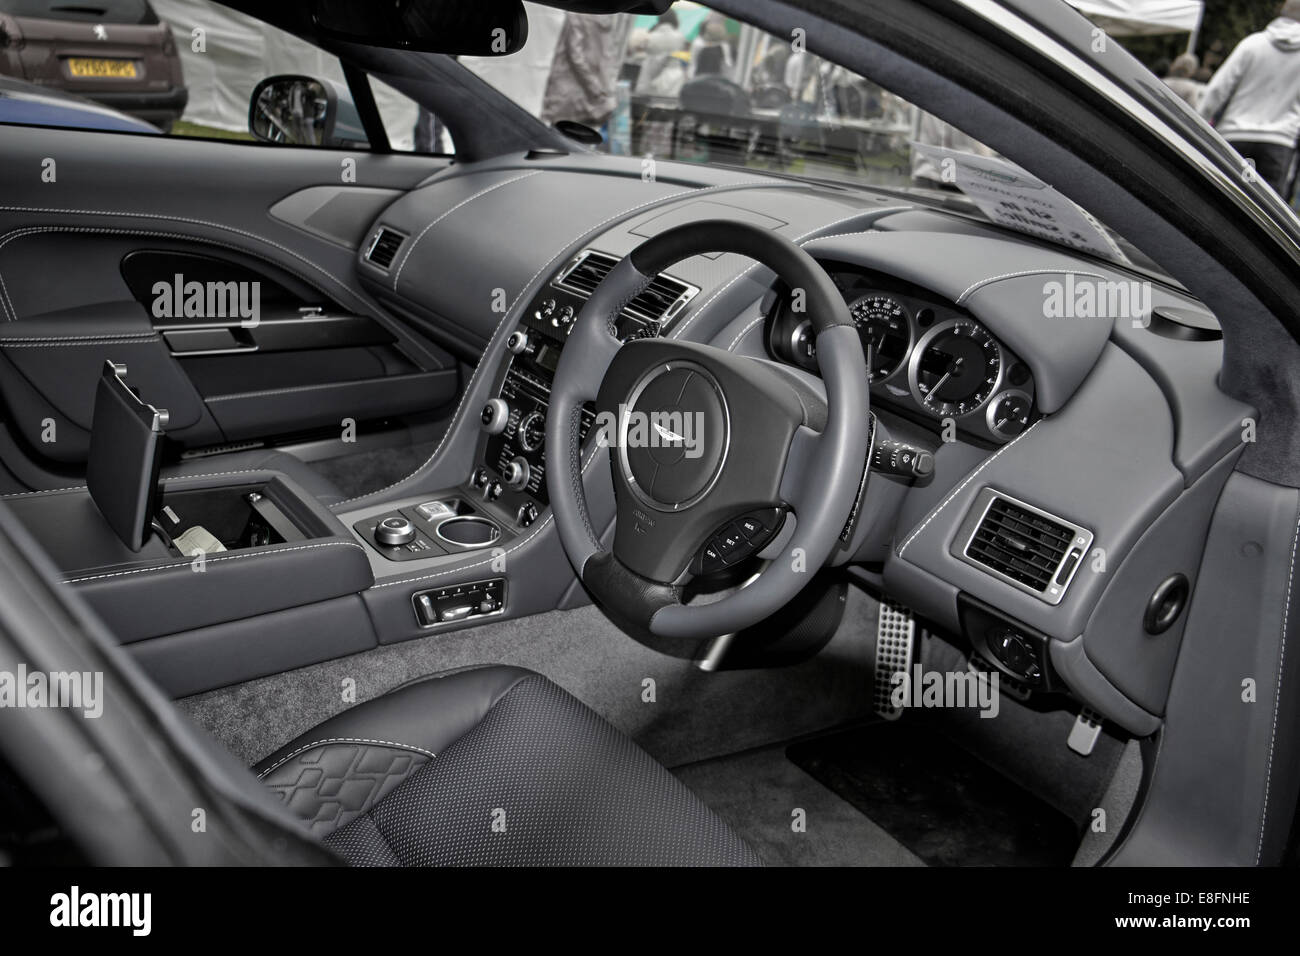 interior view of a 2014 aston martin rapide s supercar. Black Bedroom Furniture Sets. Home Design Ideas